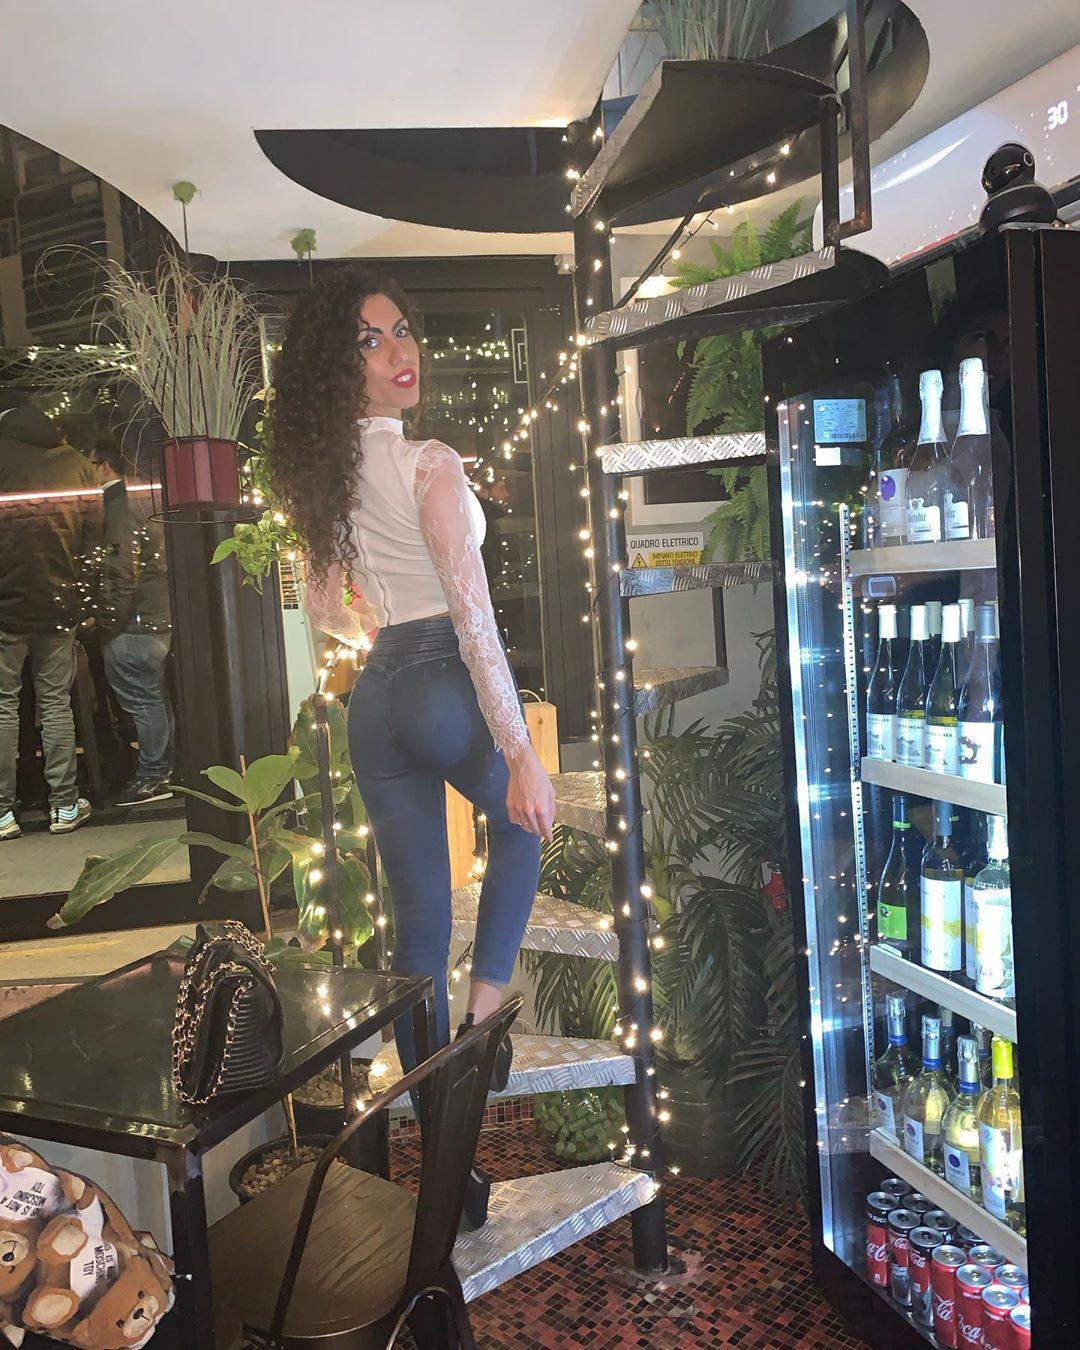 Sara-Quattrociocche-Wallpapers-Insta-Fit-Bio-15